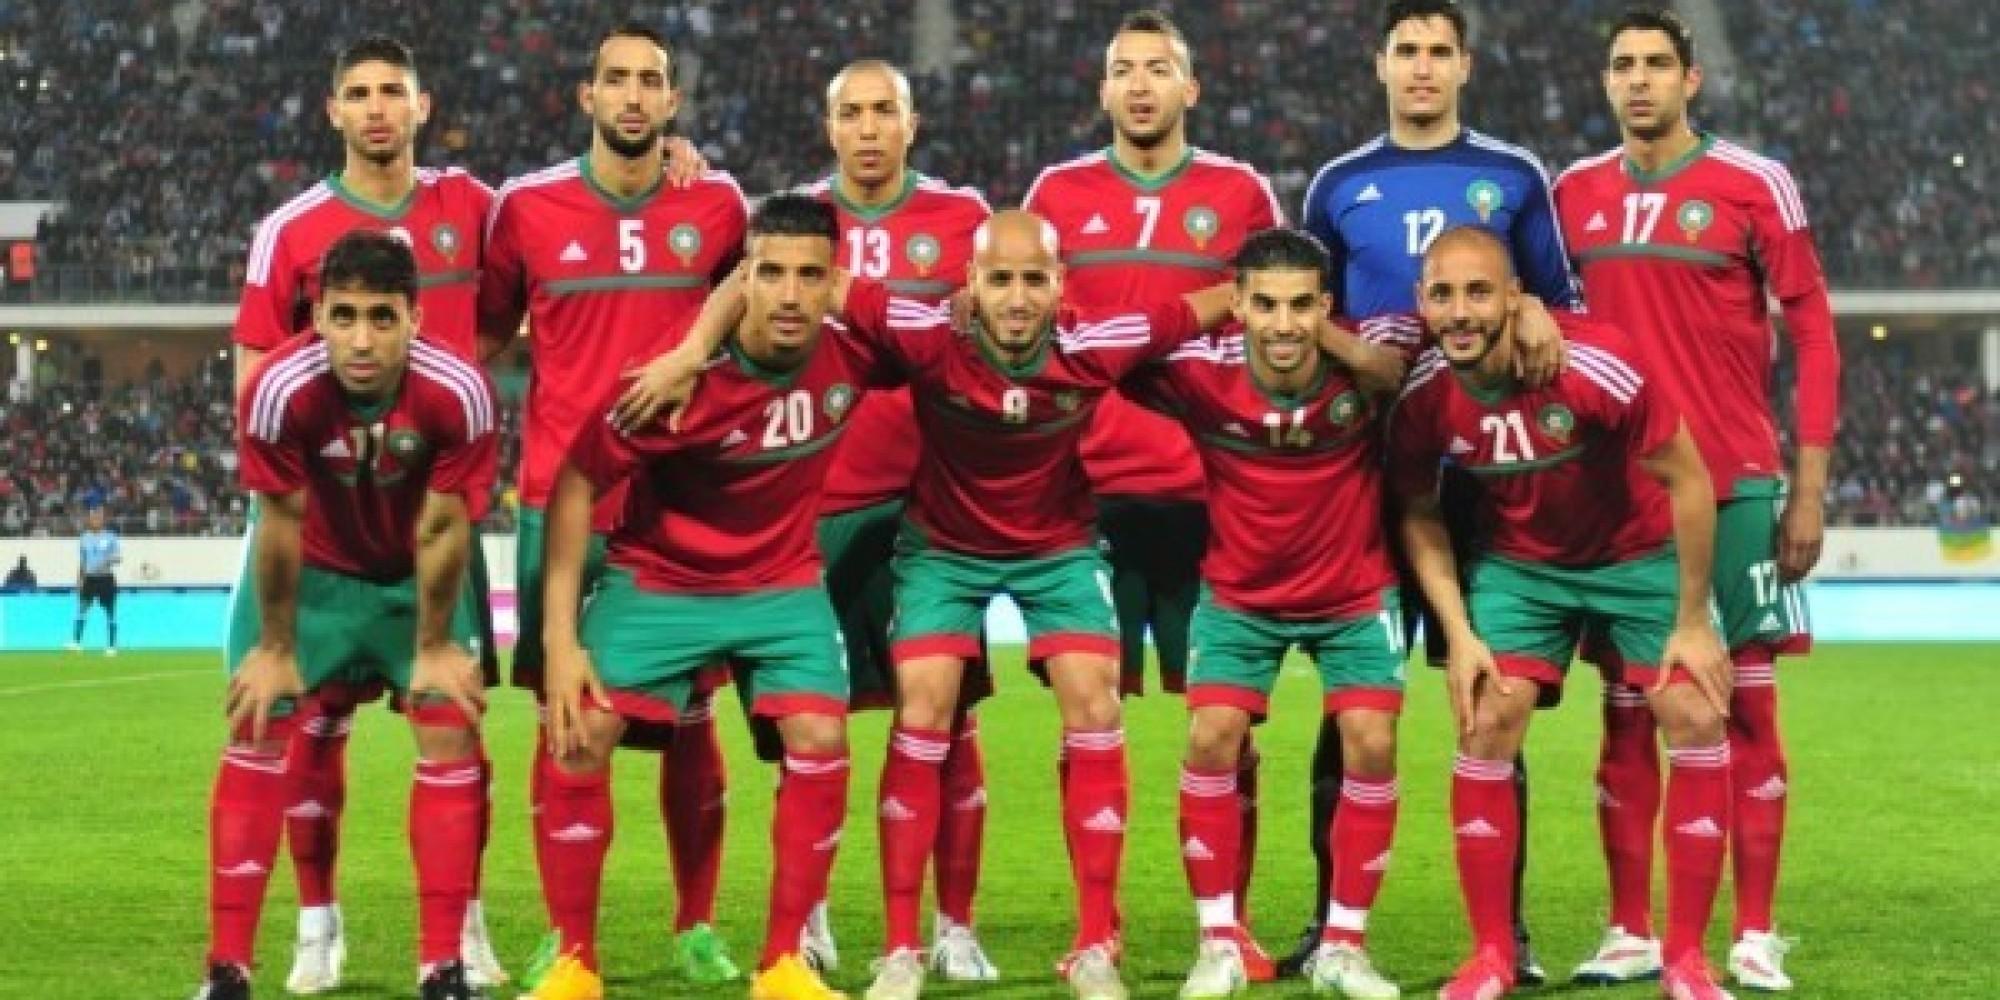 Rencontre algerie maroc foot